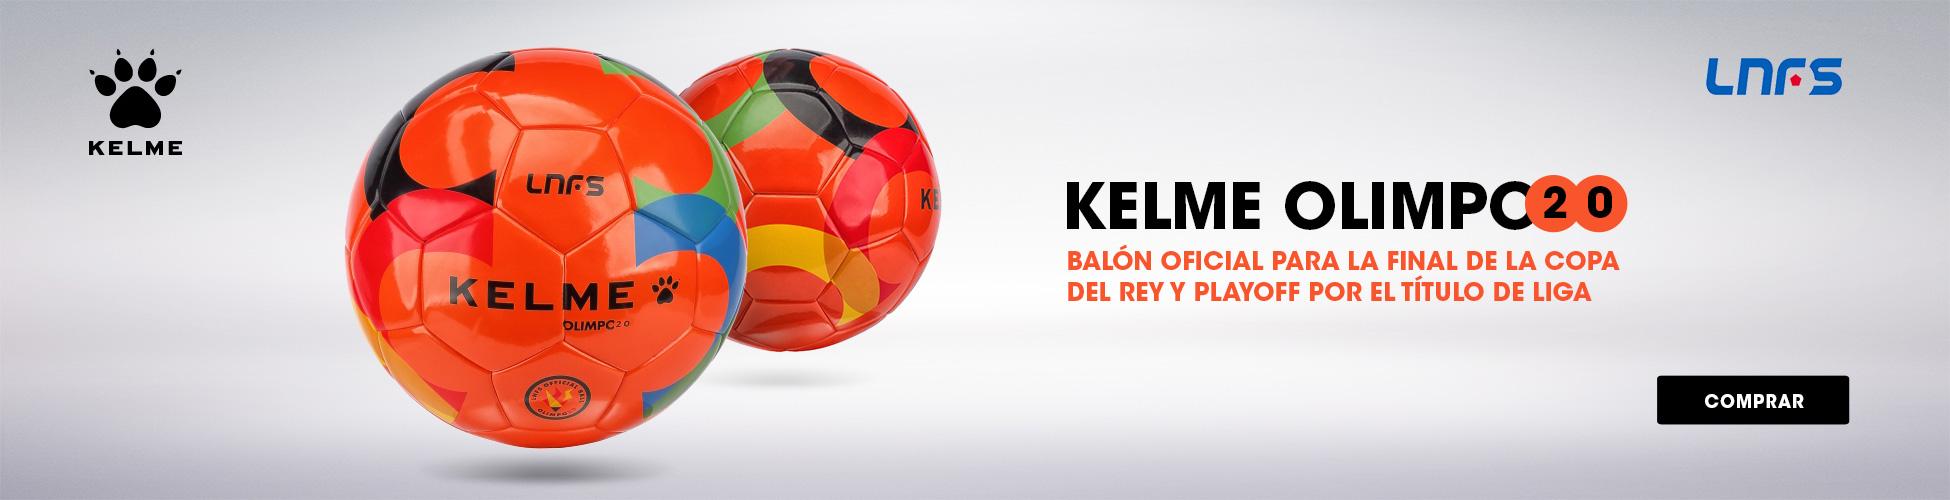 Balón Oficial LNFS Kelme Olimpo20